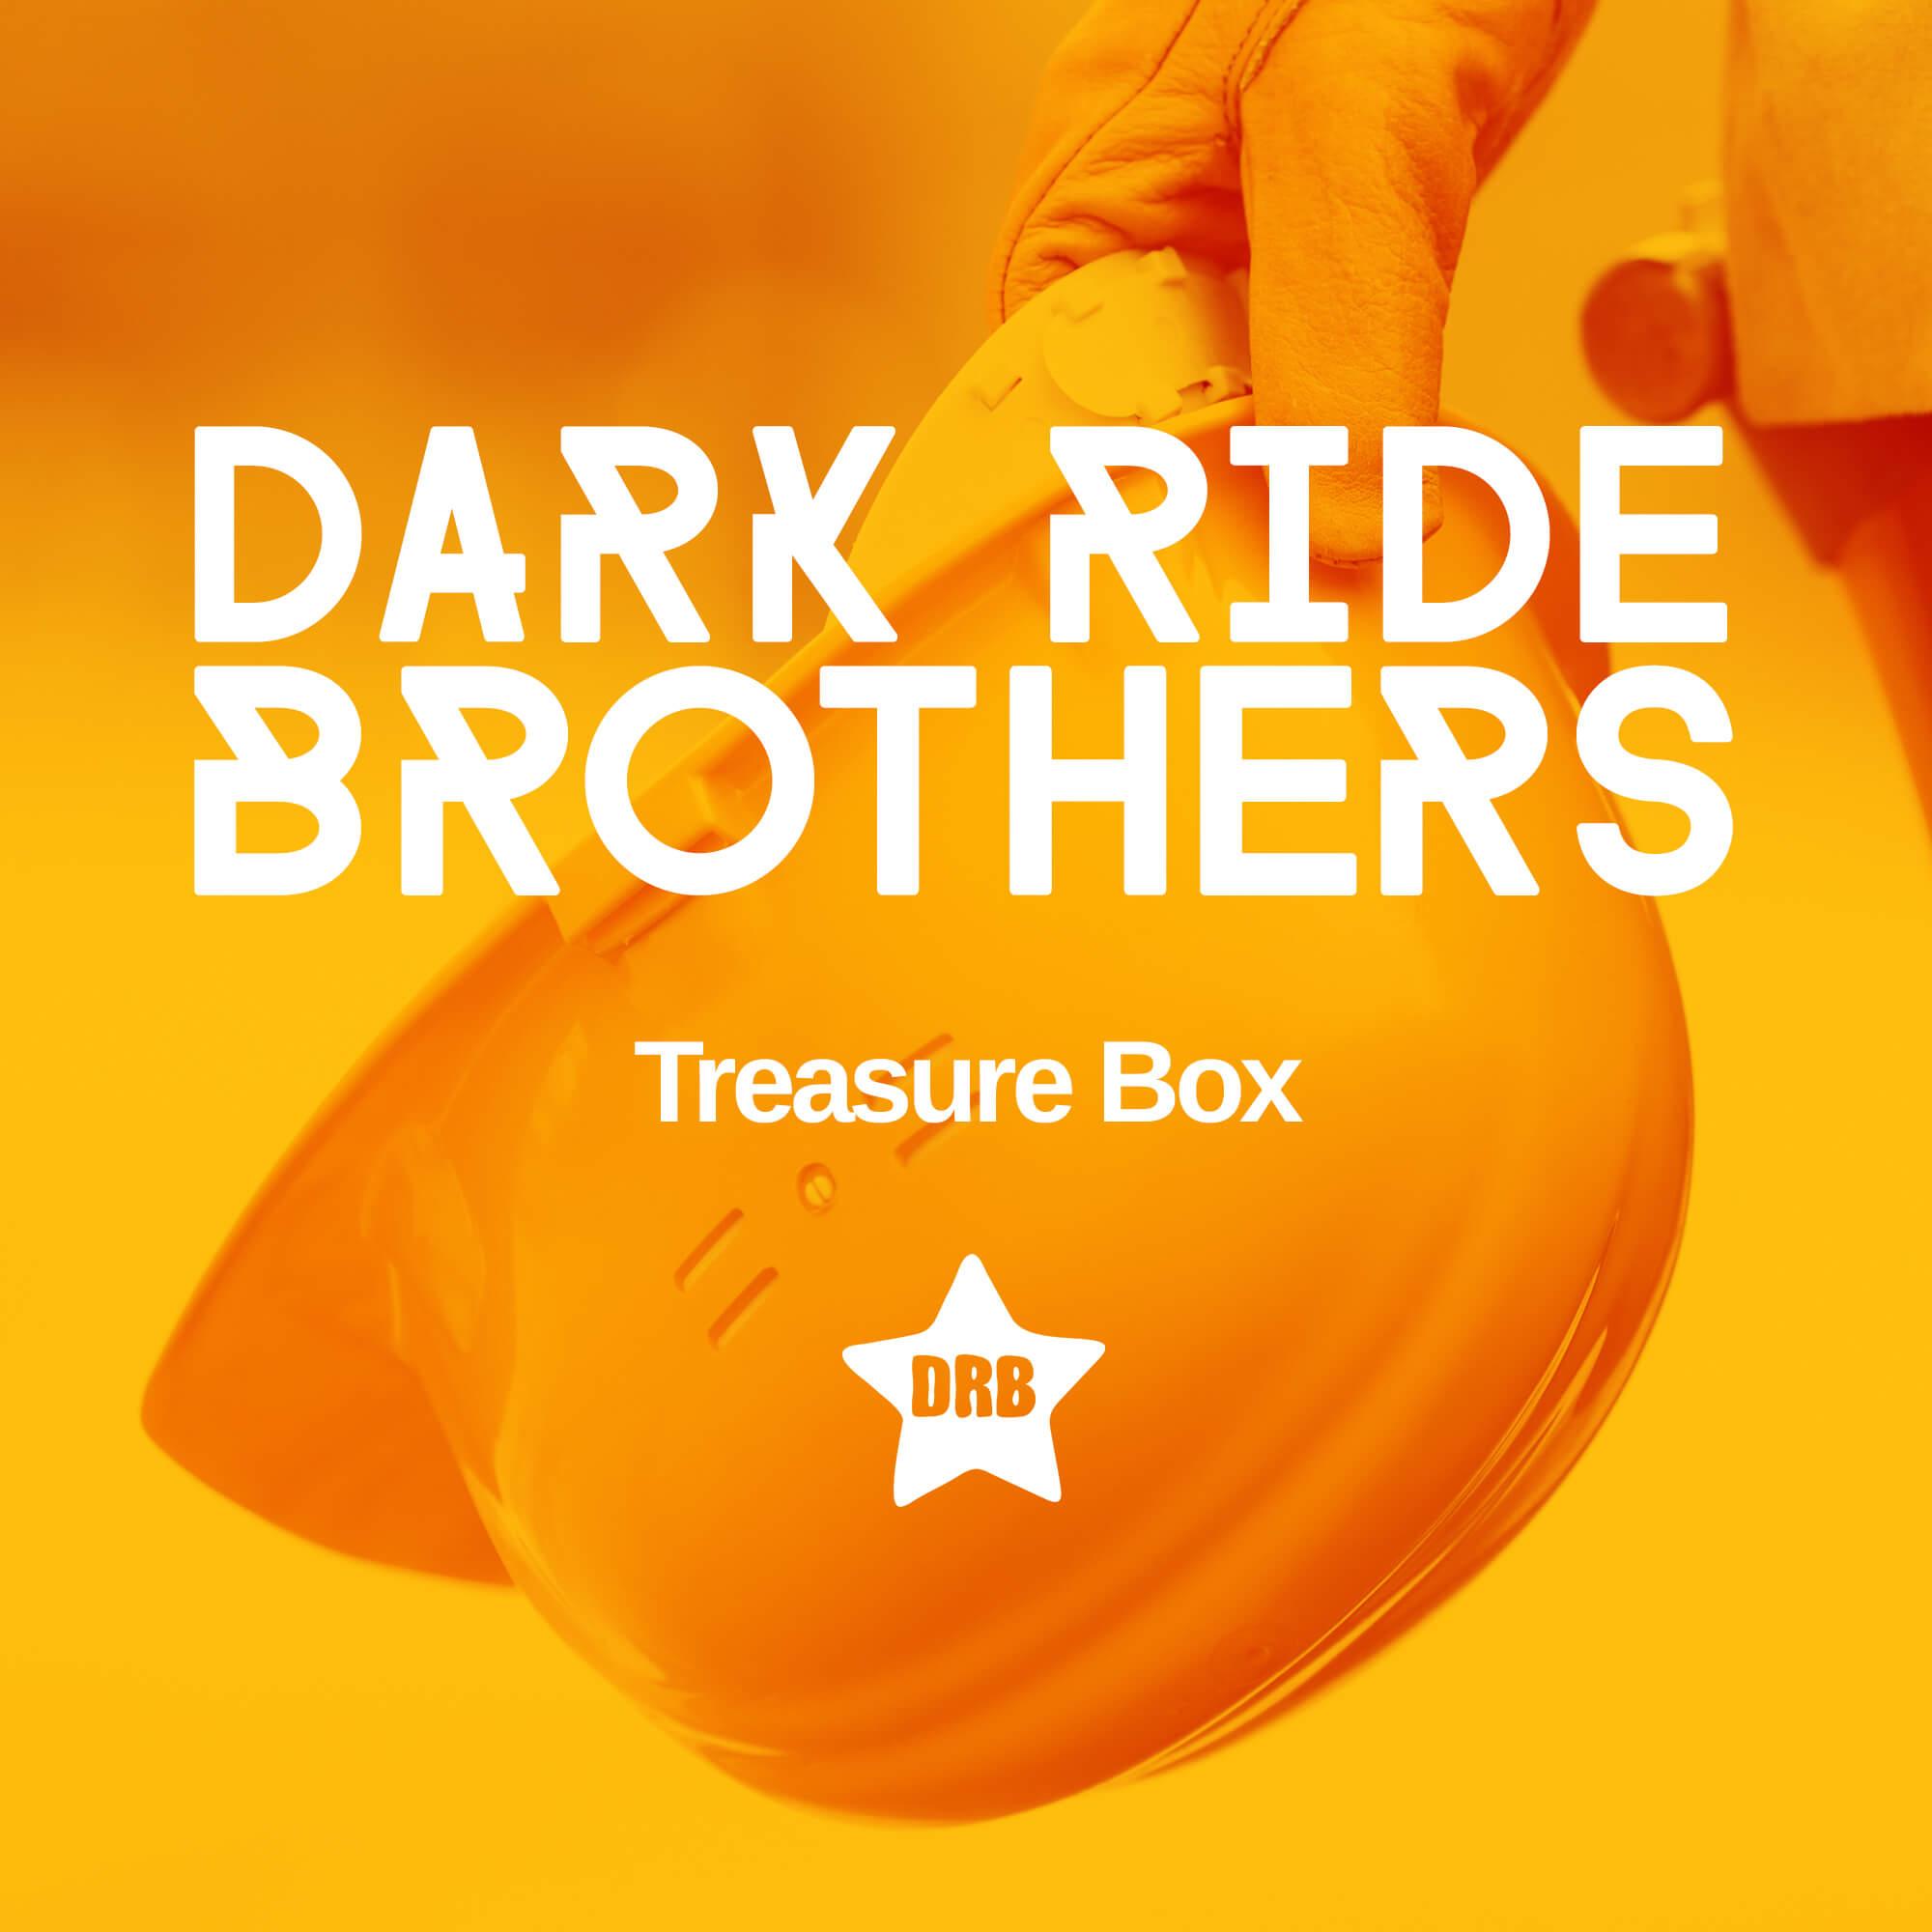 Dark Ride Brothers Spotify Playlist - Dark Ride Brothers Treasure Box